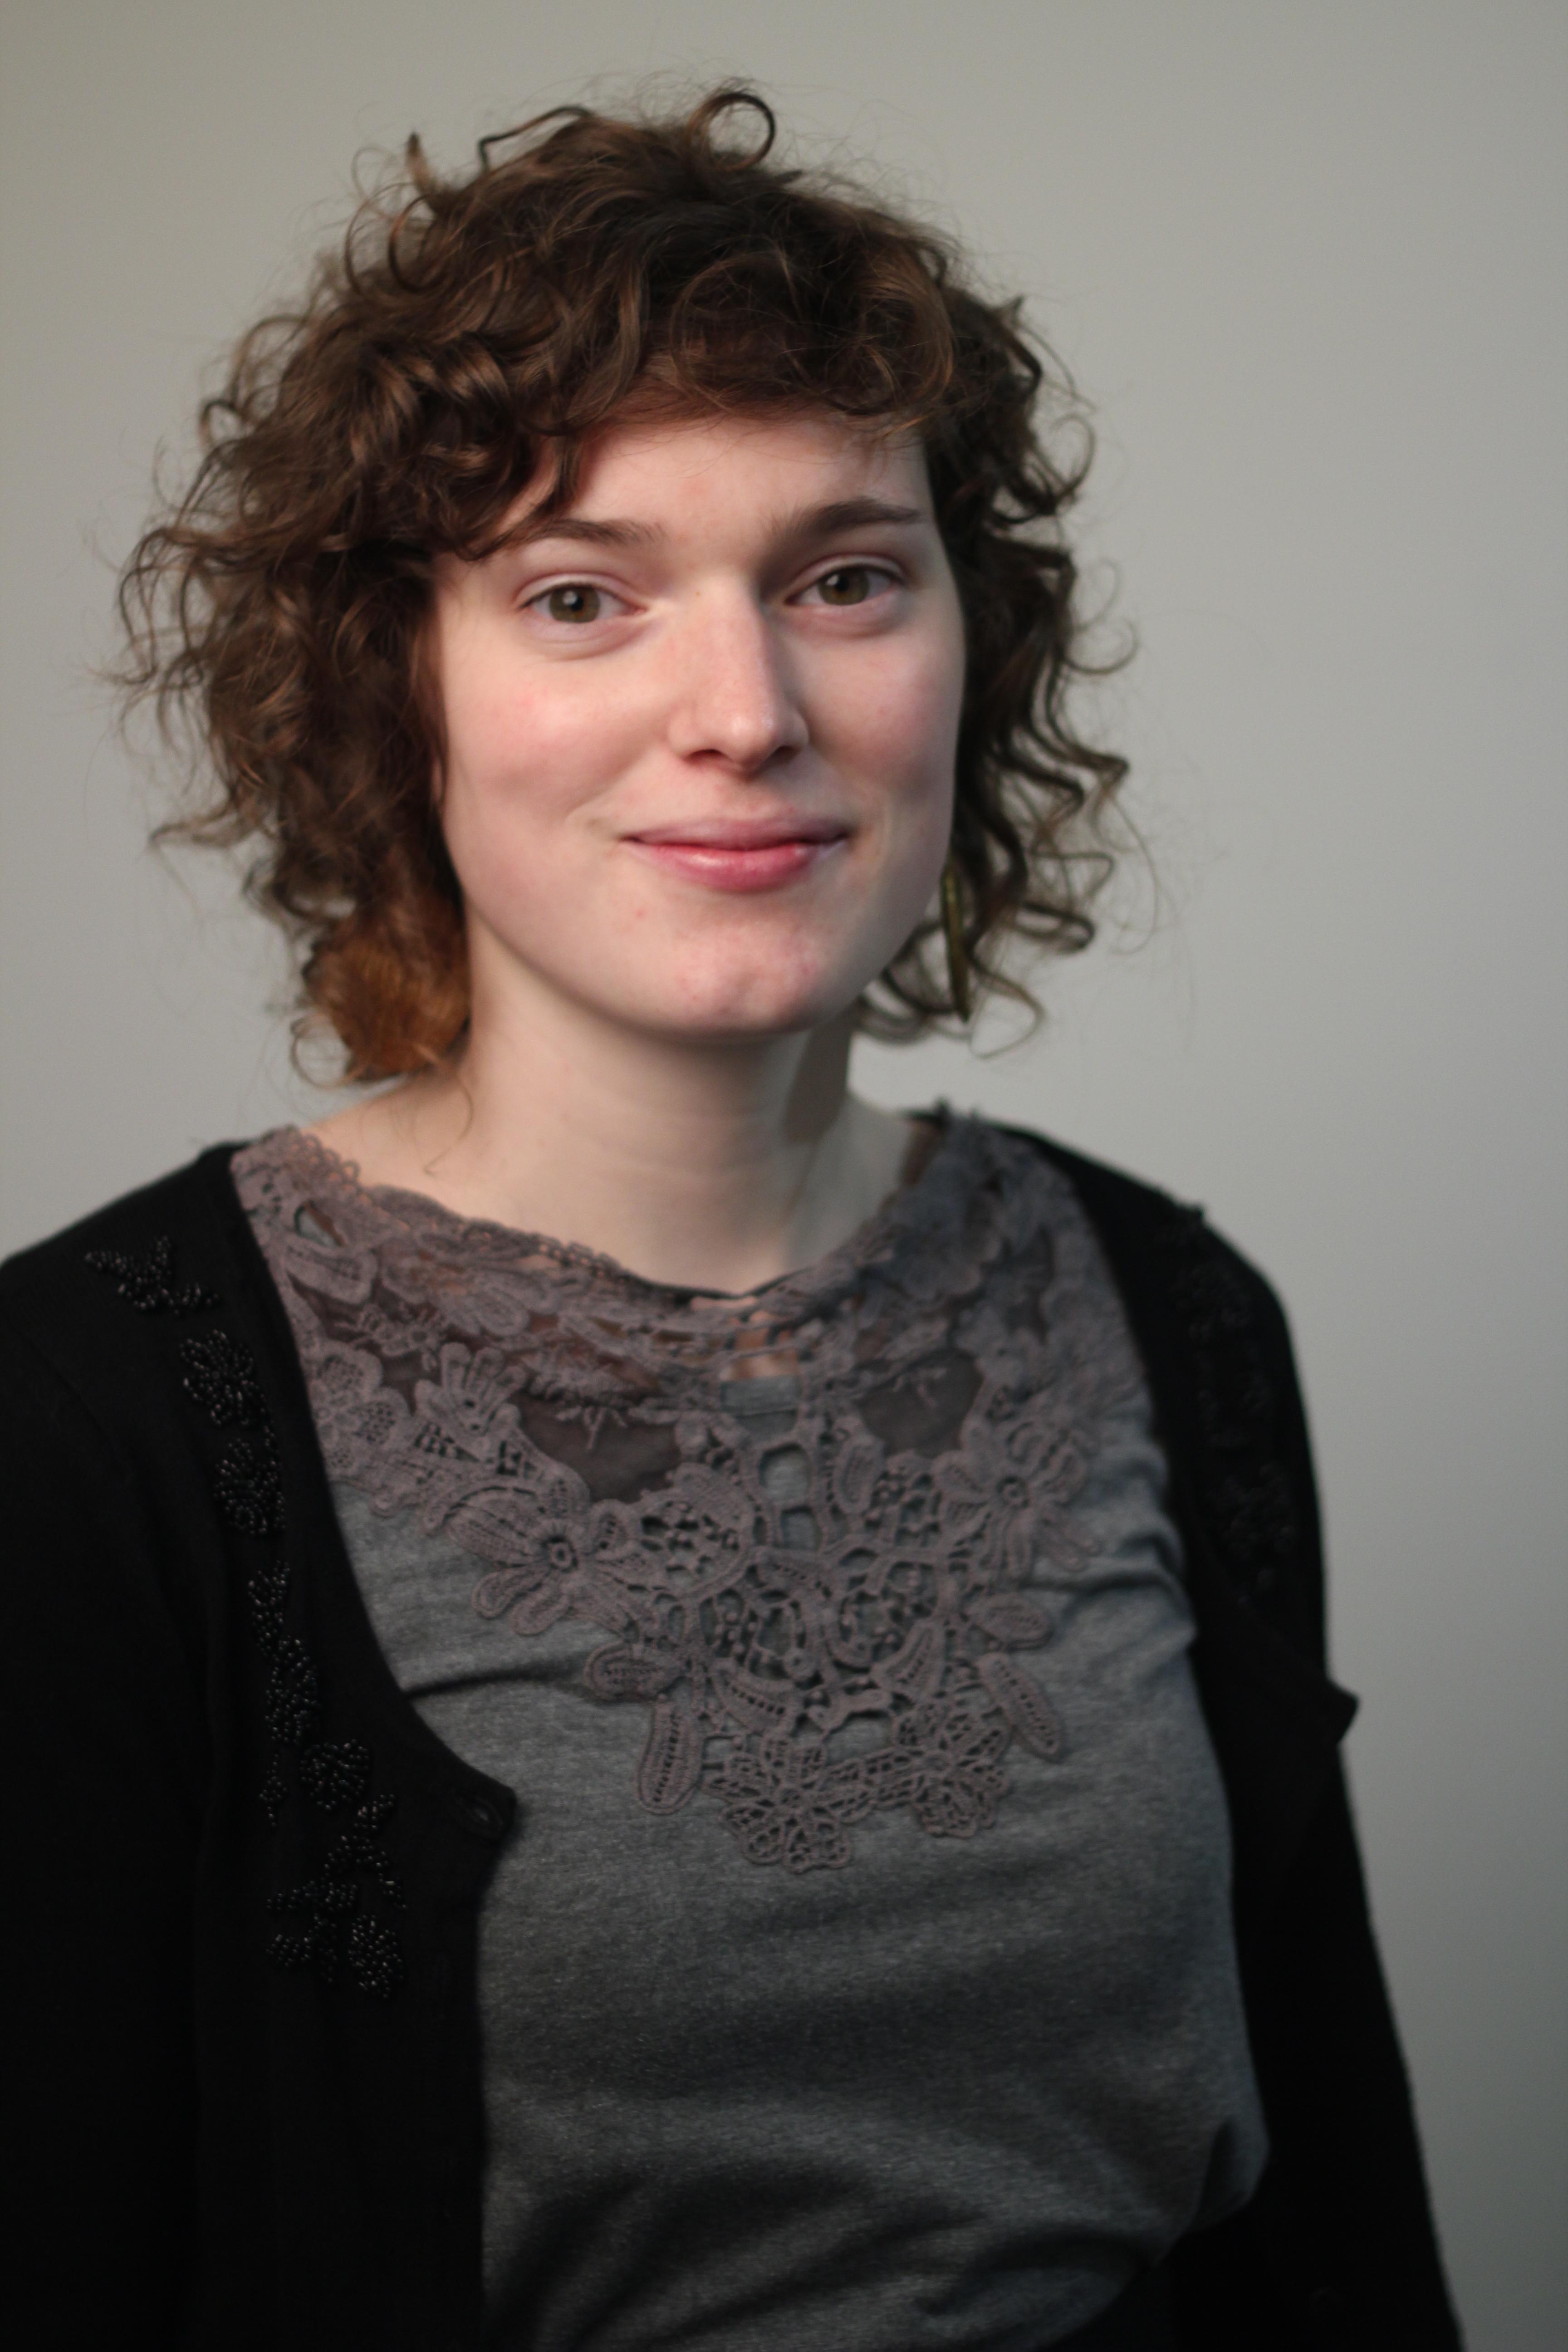 Eva Florizoone